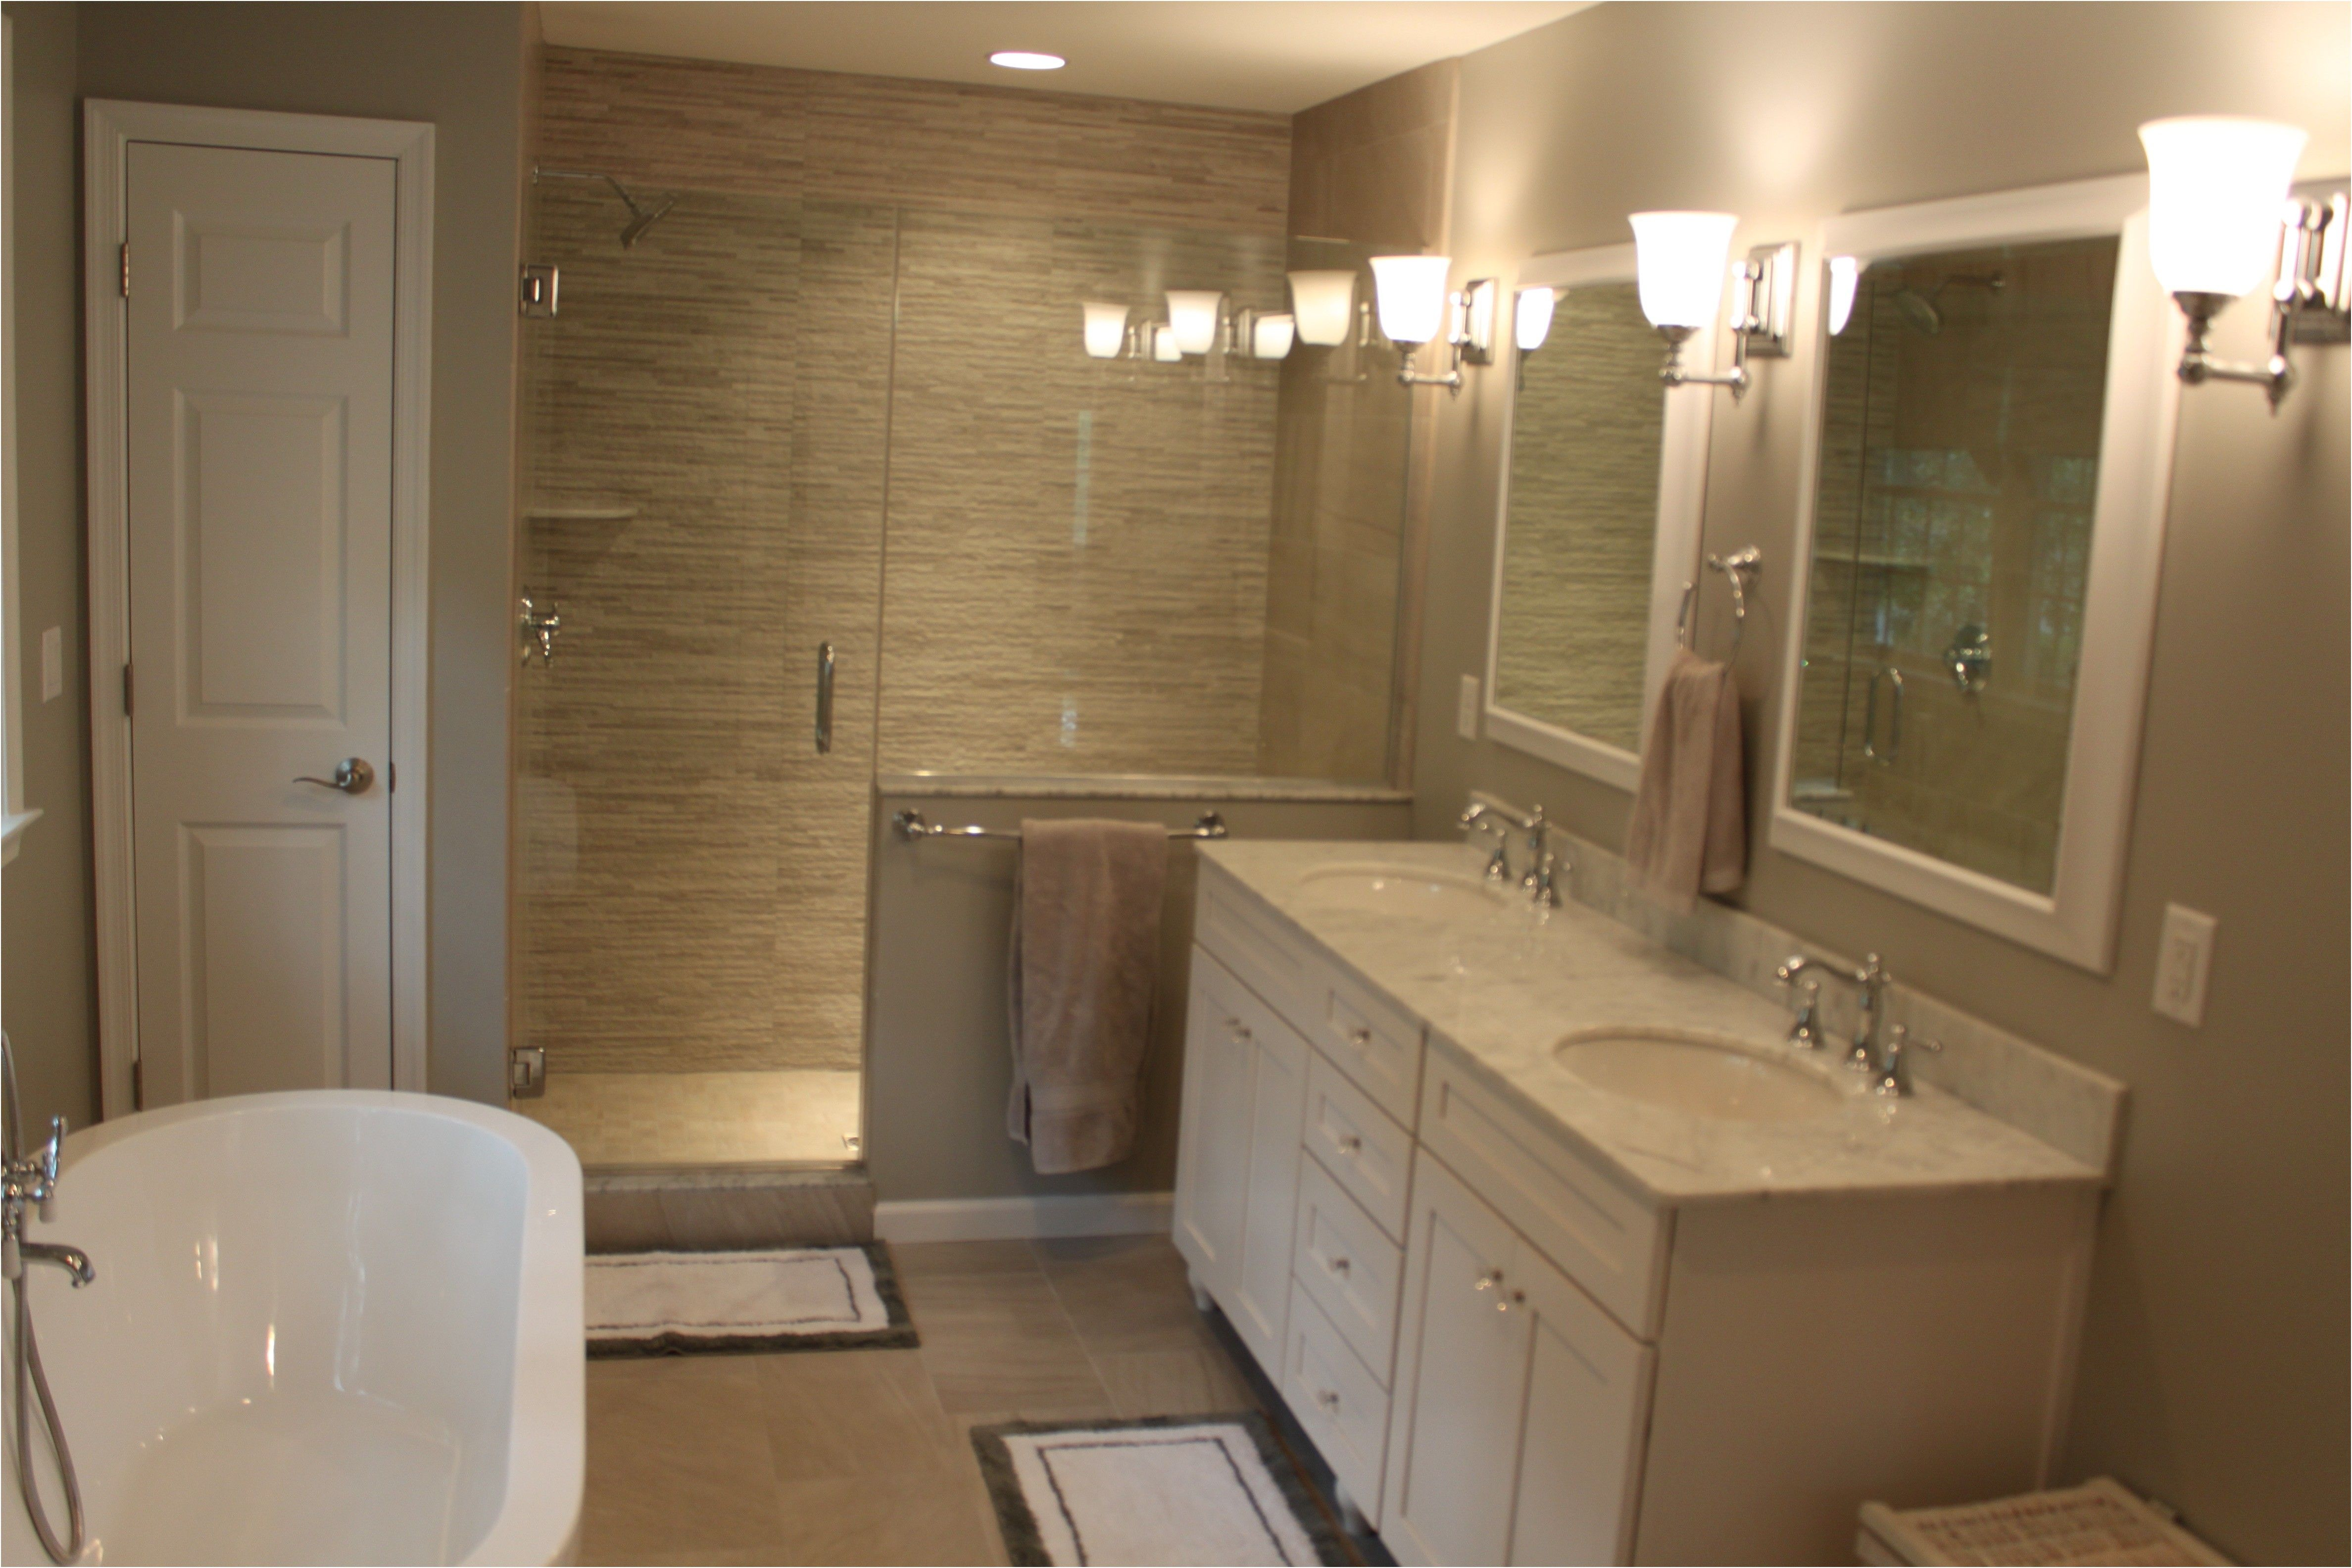 amazing design 12 jeff lewis bathroom designs home design ideas from ...